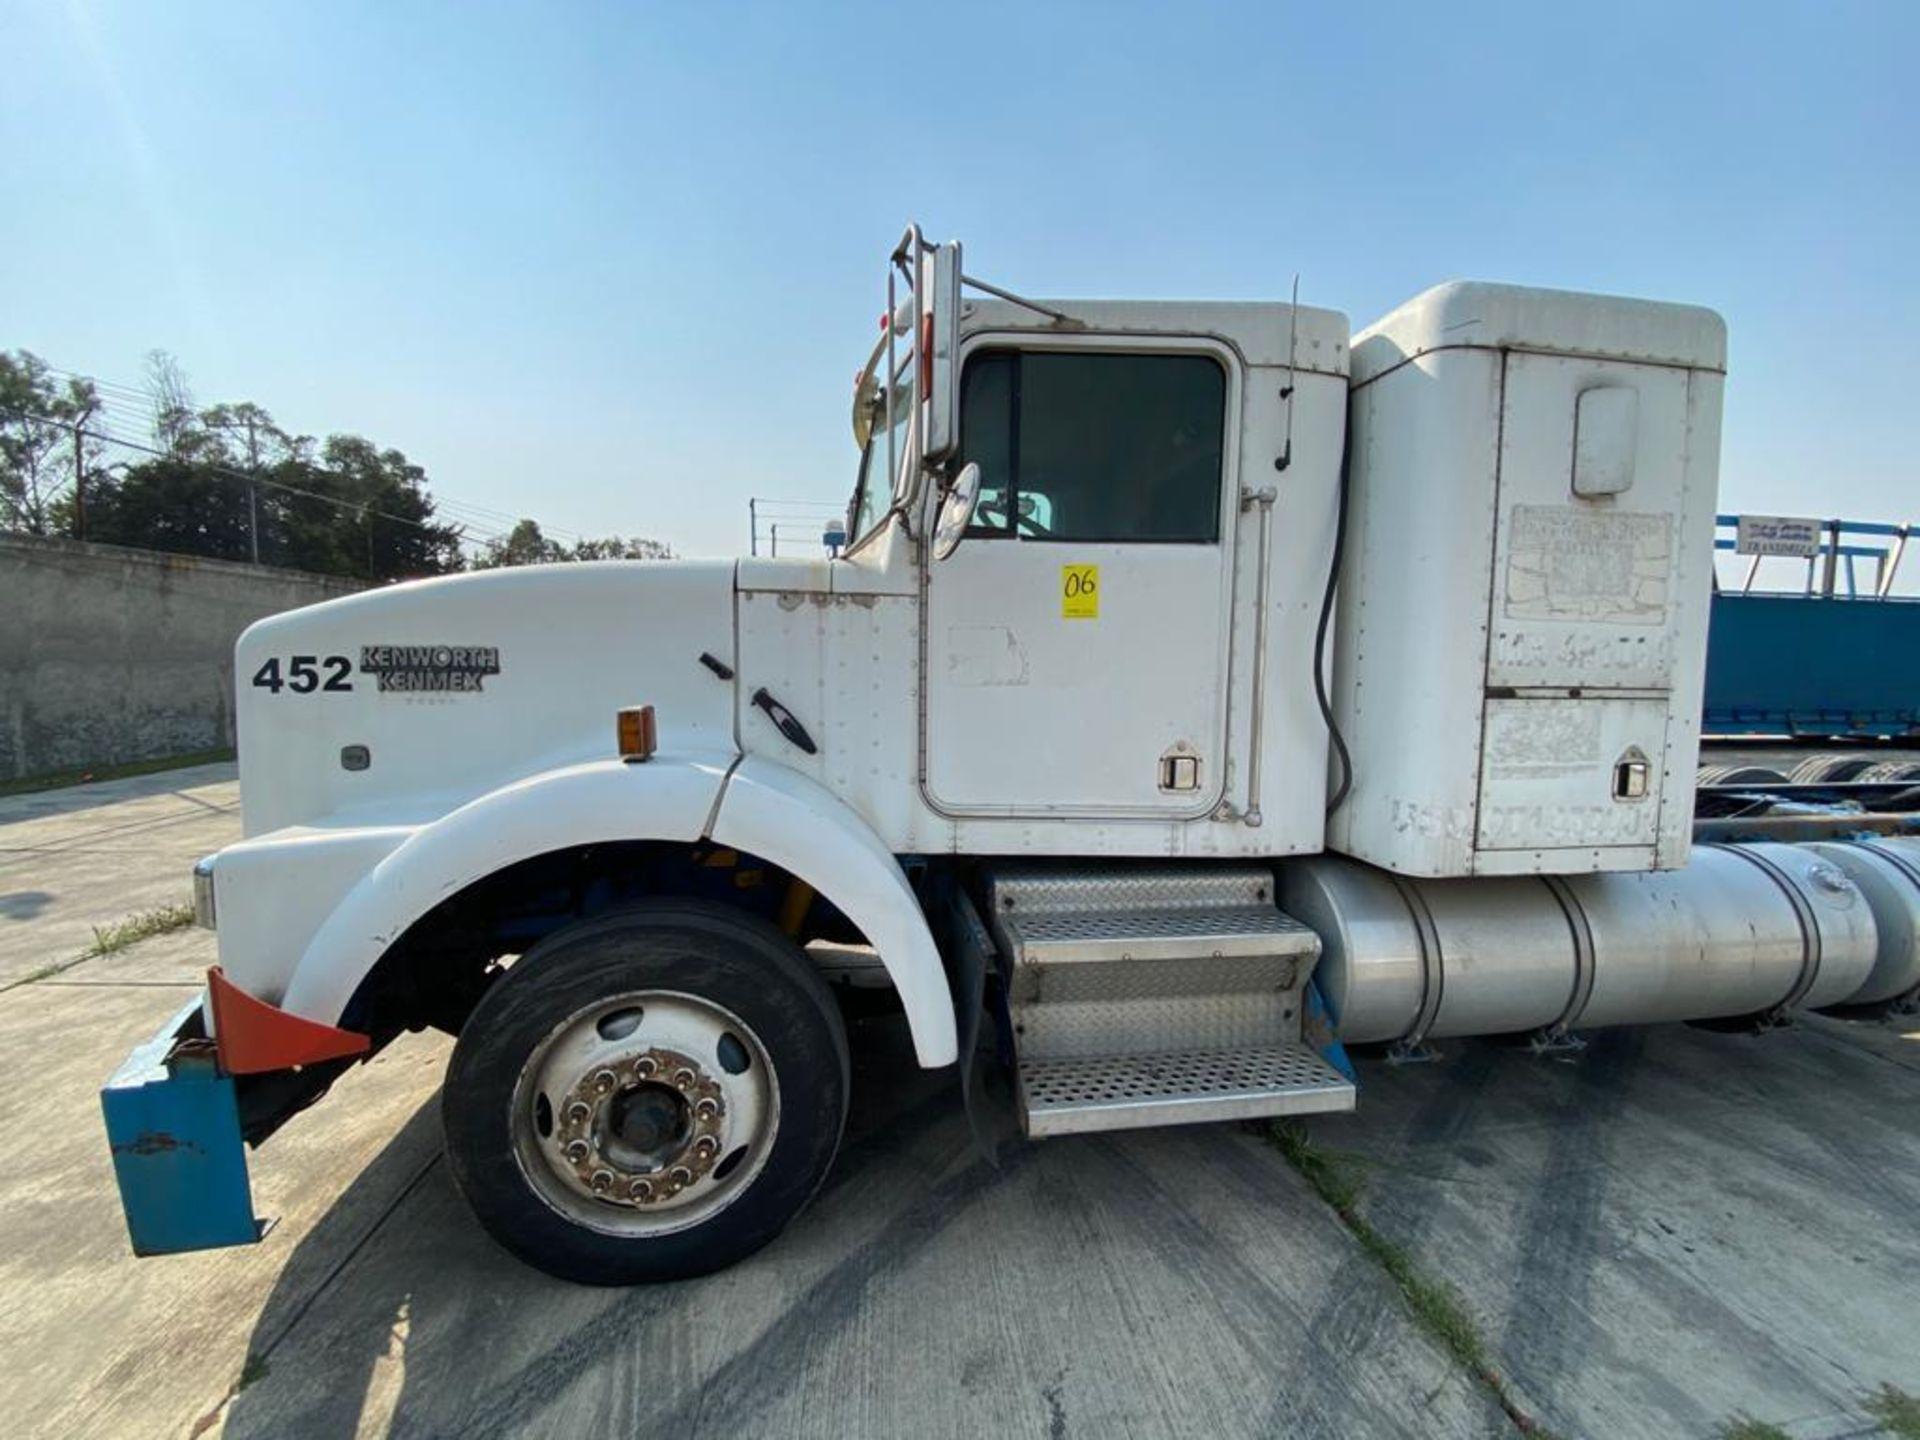 1998 Kenworth Sleeper truck tractor, standard transmission of 18 speeds - Image 56 of 75